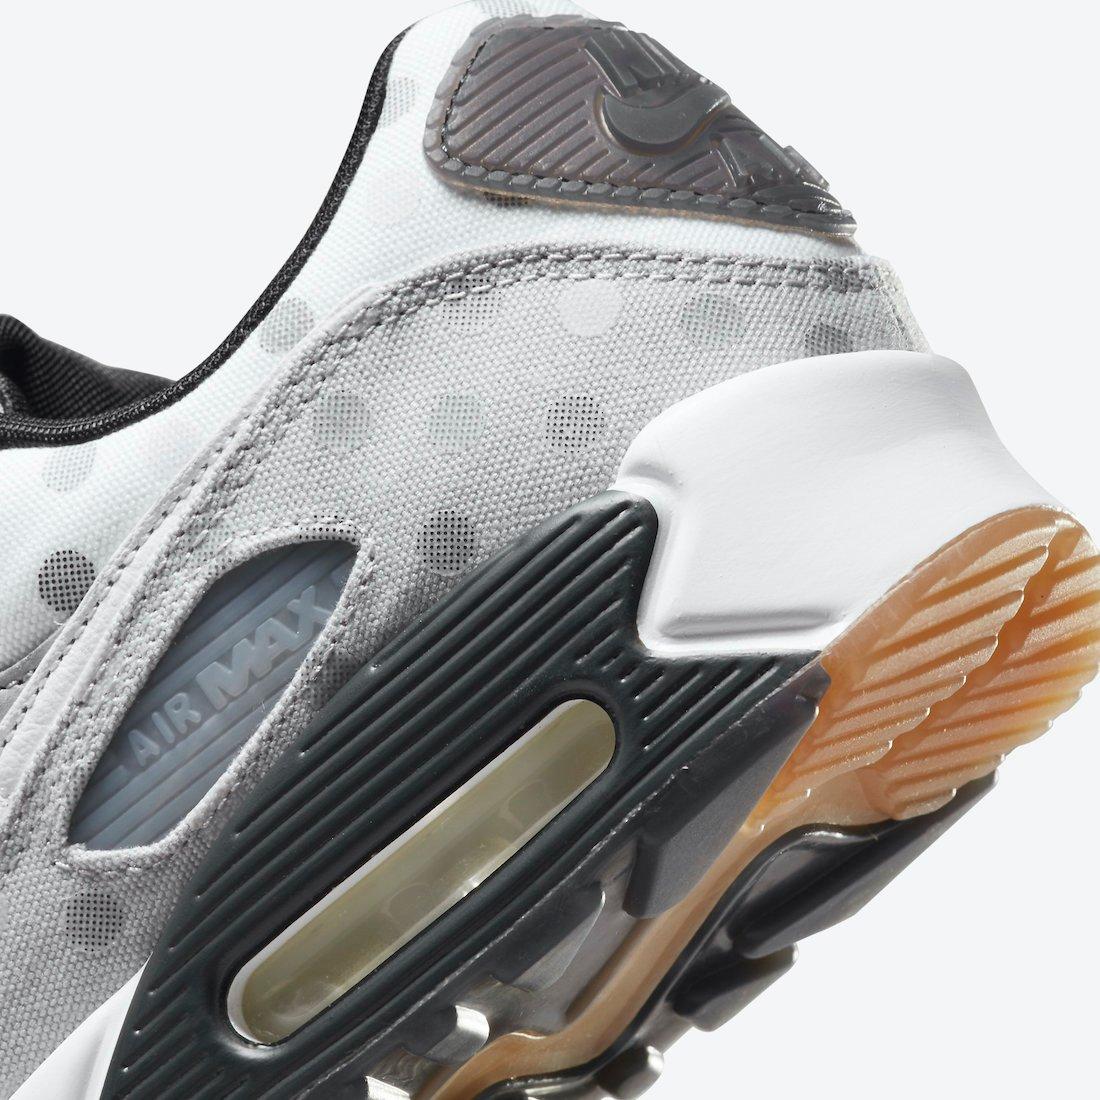 Nike Air Max 90 Summit White Grey Fog Black CZ1929-100 Release Date Info